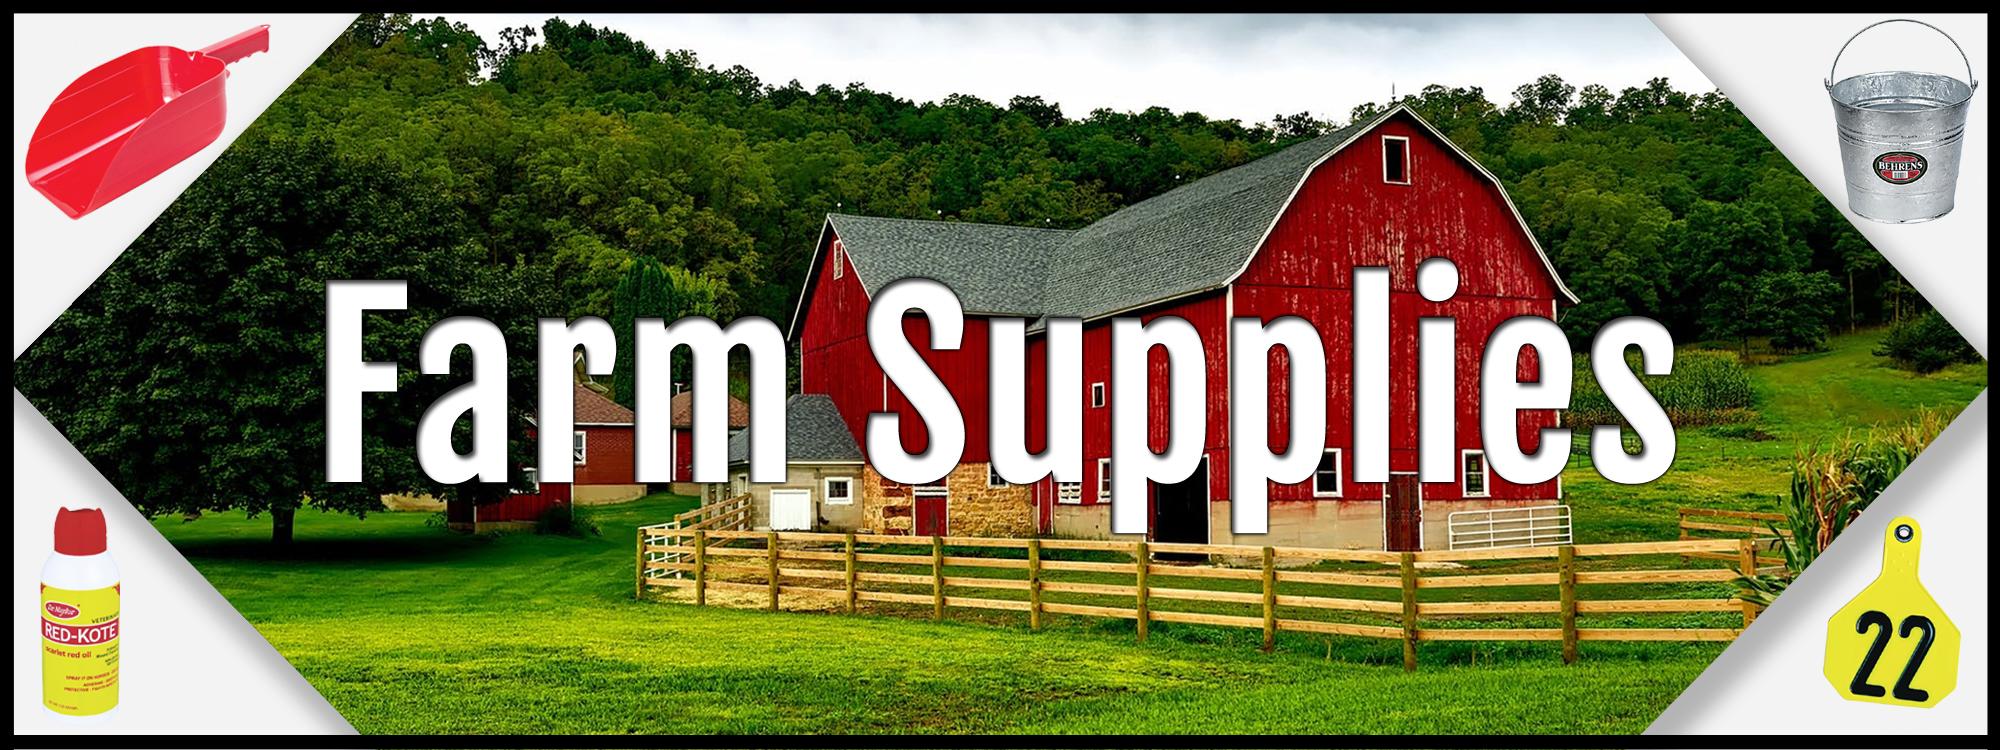 NEW FARMING BANNER copy.jpg